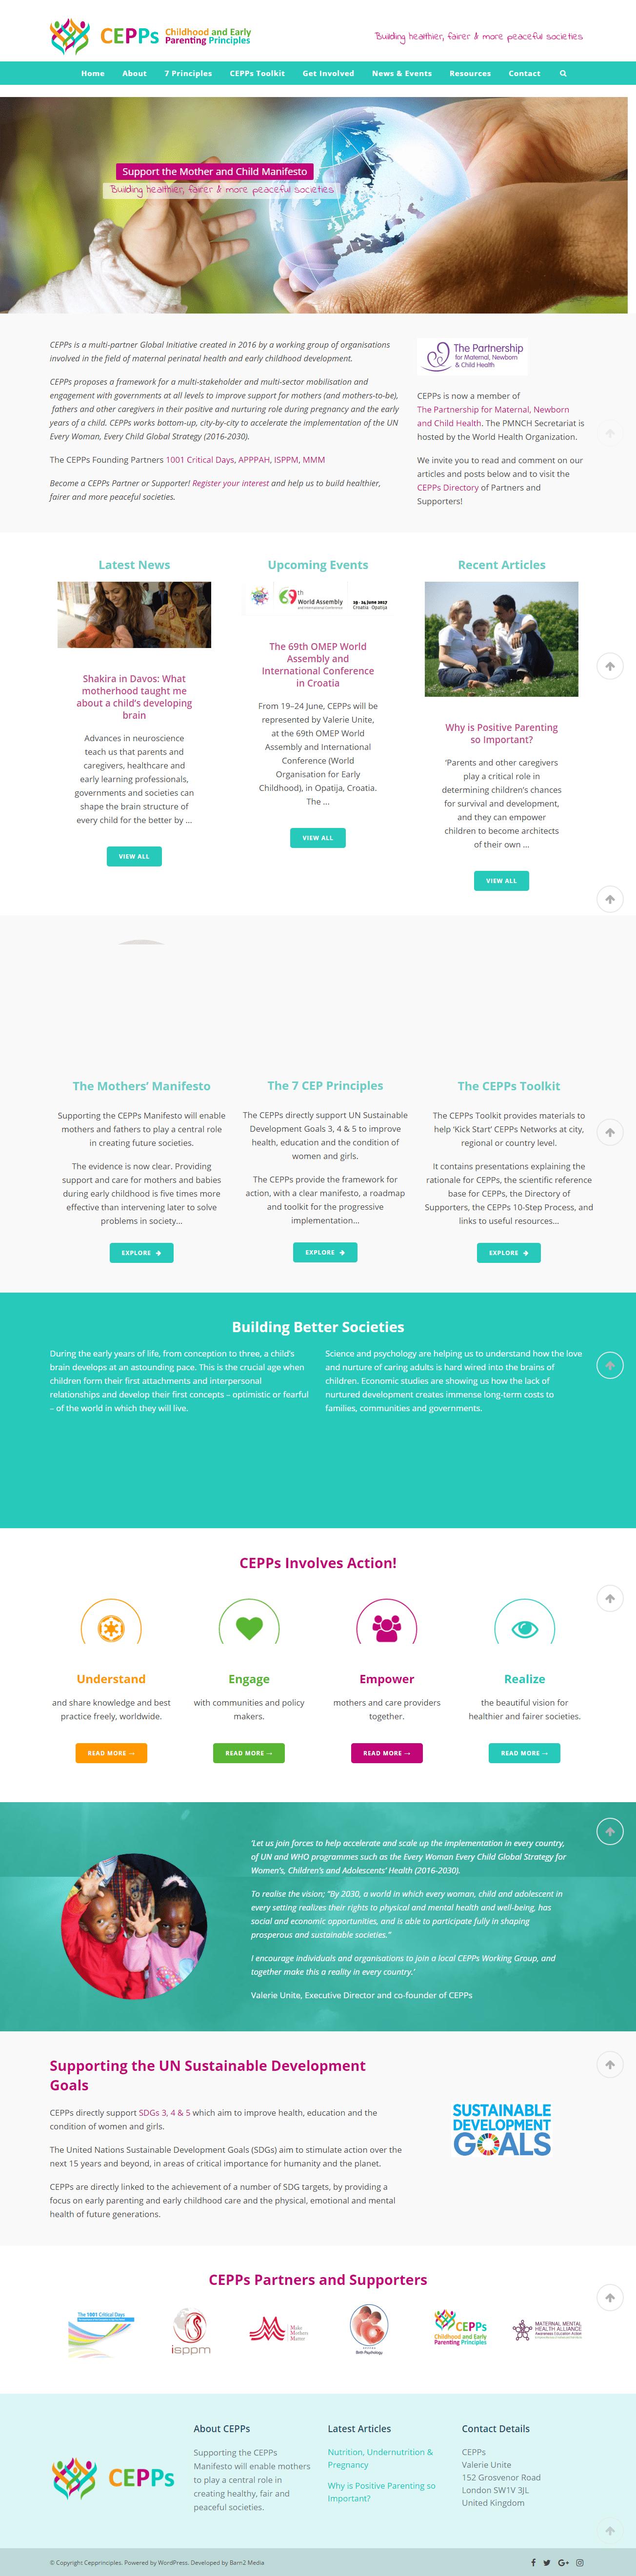 cepprinciples.org